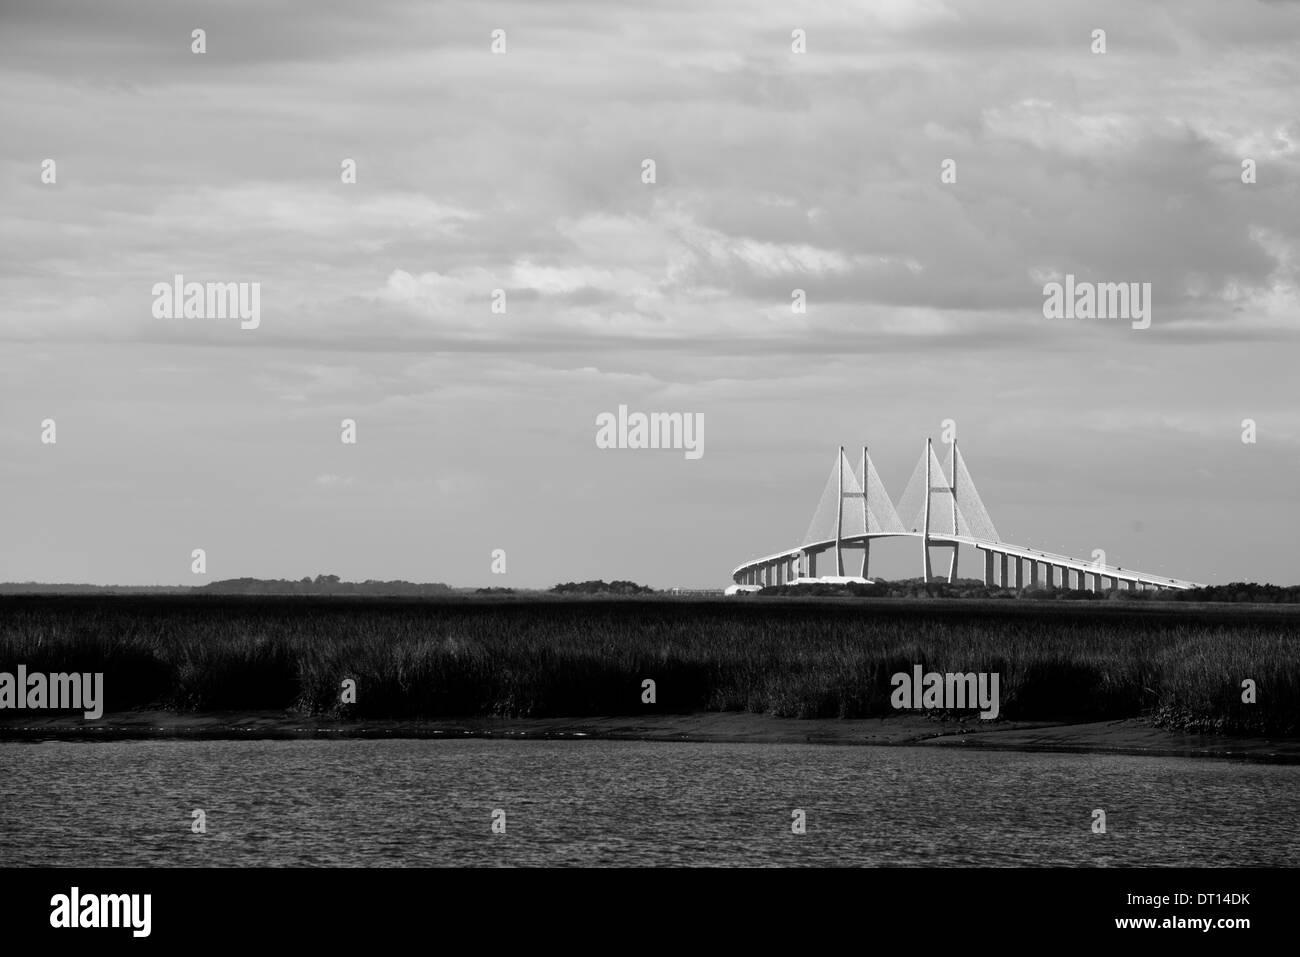 Imaage of Lanier Bridge just south of Brunswick, Georgia - Stock Image